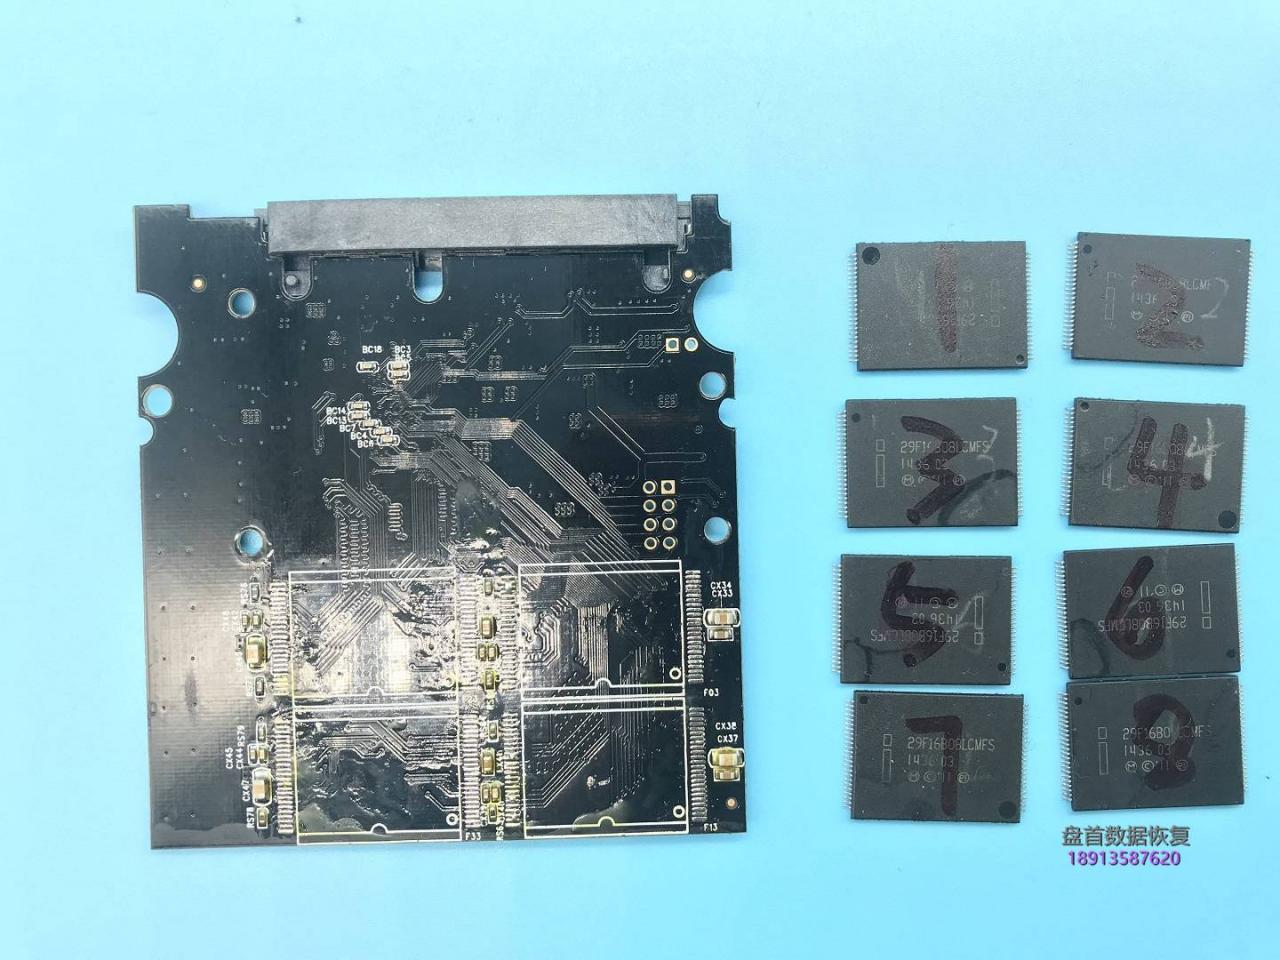 SSD固态硬盘芯片级数据恢复SM2246XT全盘跑黑块二次恢复成功BSY长忙无法识别情况不读盘